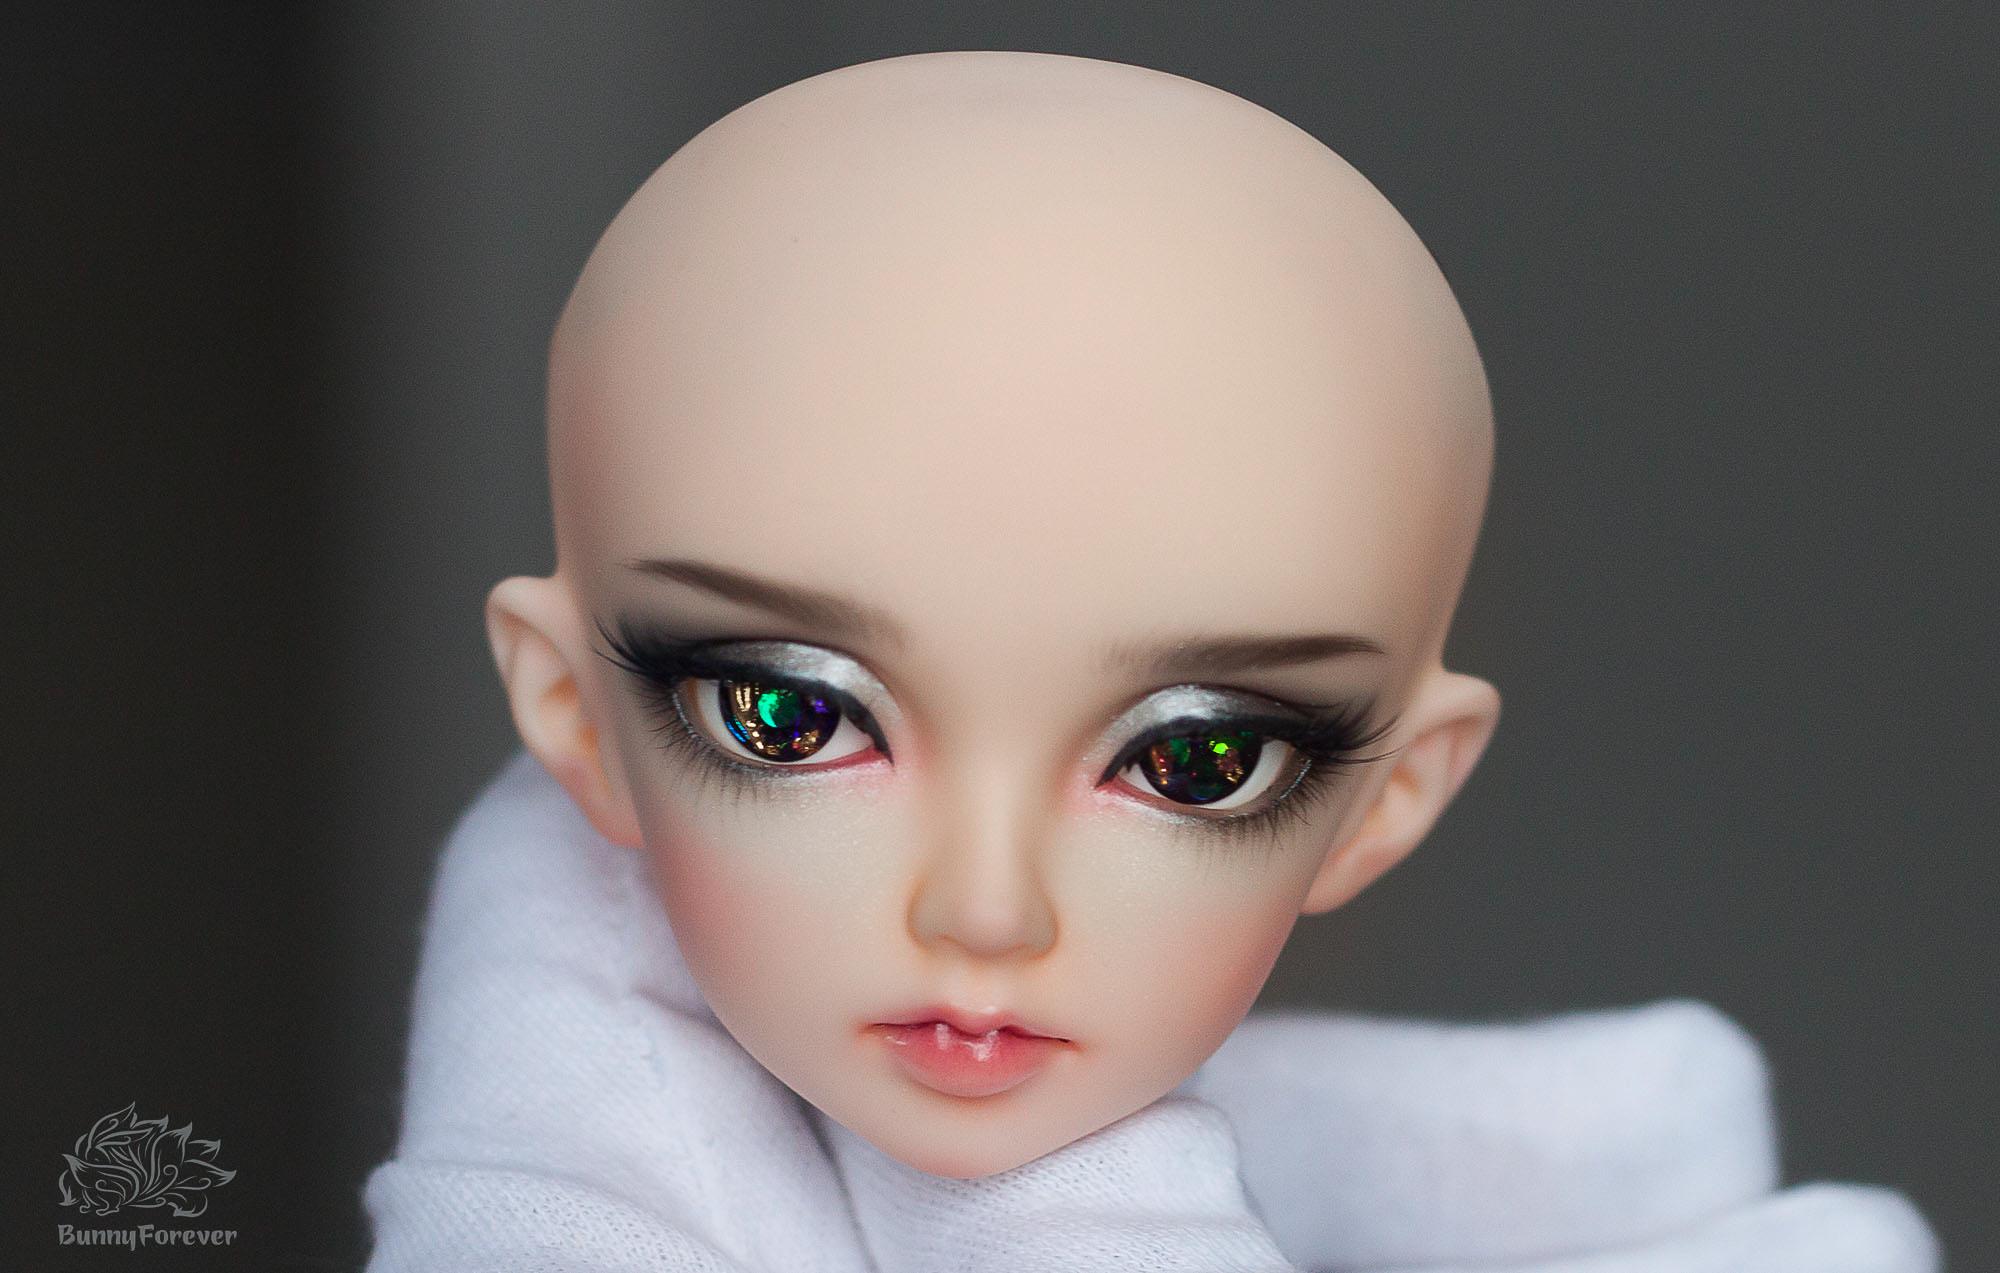 balljointeddoll, ball jointed doll, bjd, bjd doll, face-up, faceup, face-up bjd, faceup bjd. faceup commission, face-up commission, búp bê bjd, bjddoll, balljointdoll, fairylandbjd, minifee, kai